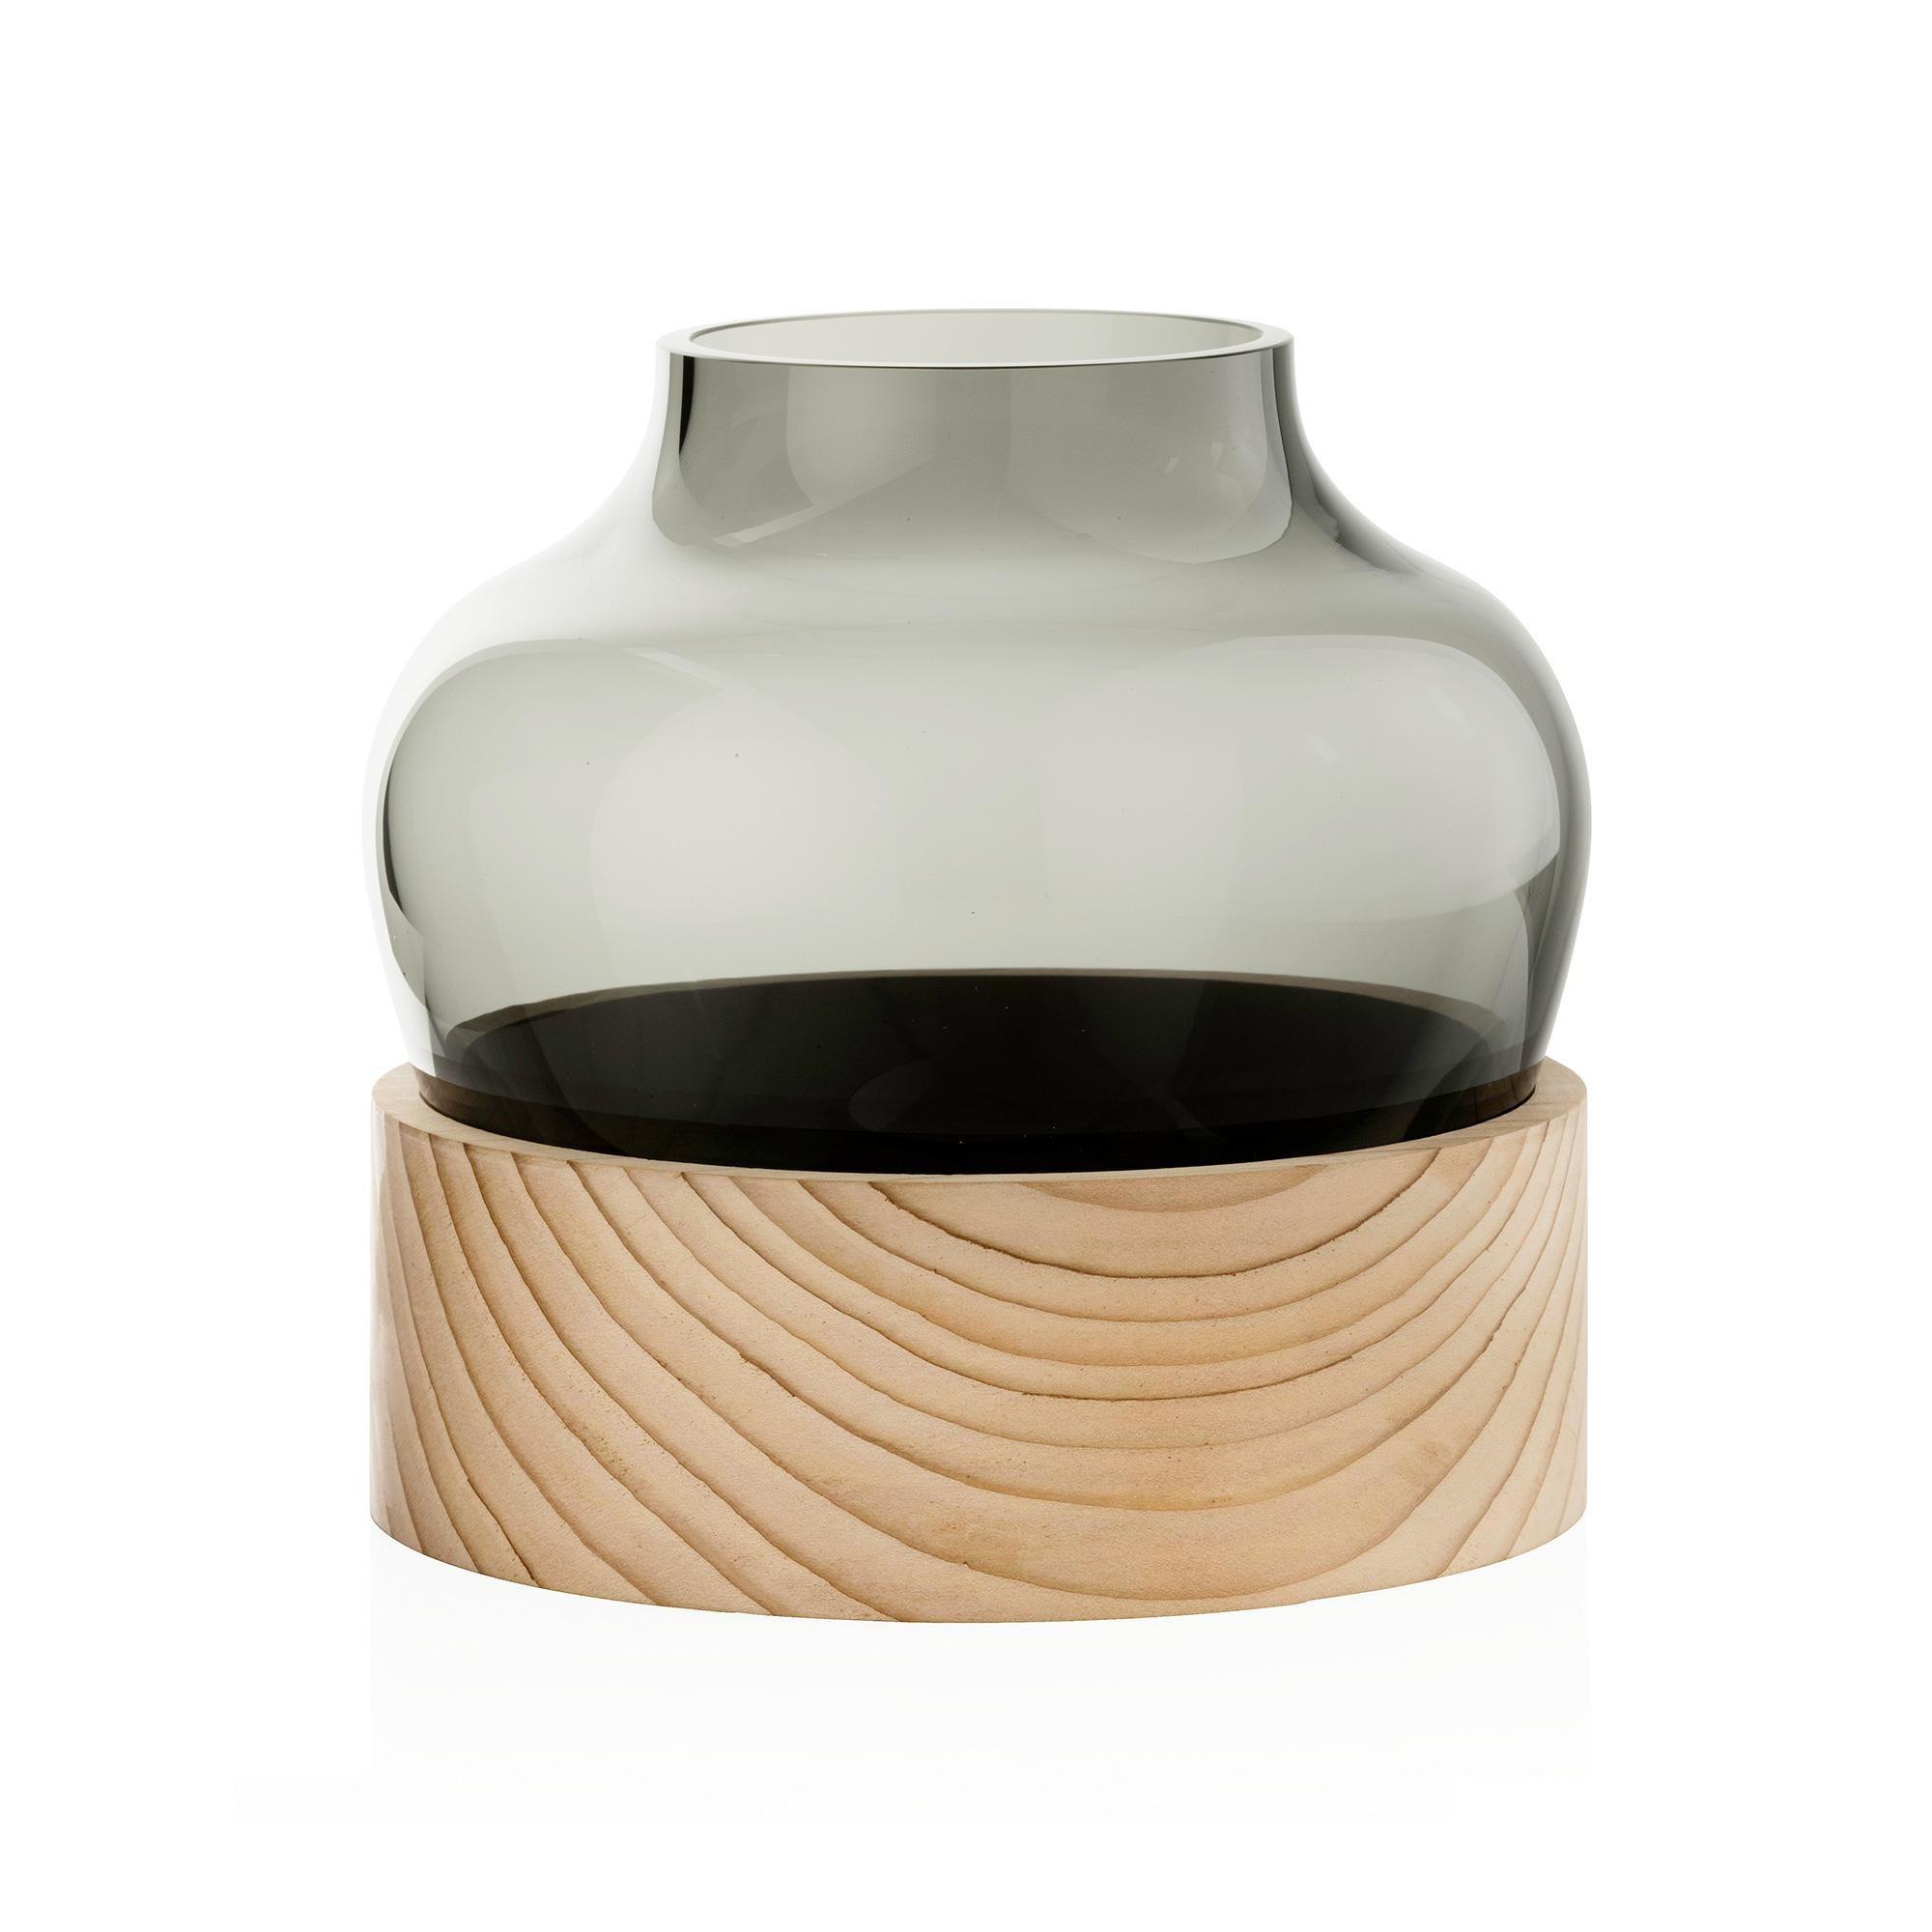 4 x 18 cylinder vase of fritz hansen vase ambientedirect with regard to fritz hansen fritz hansen vase